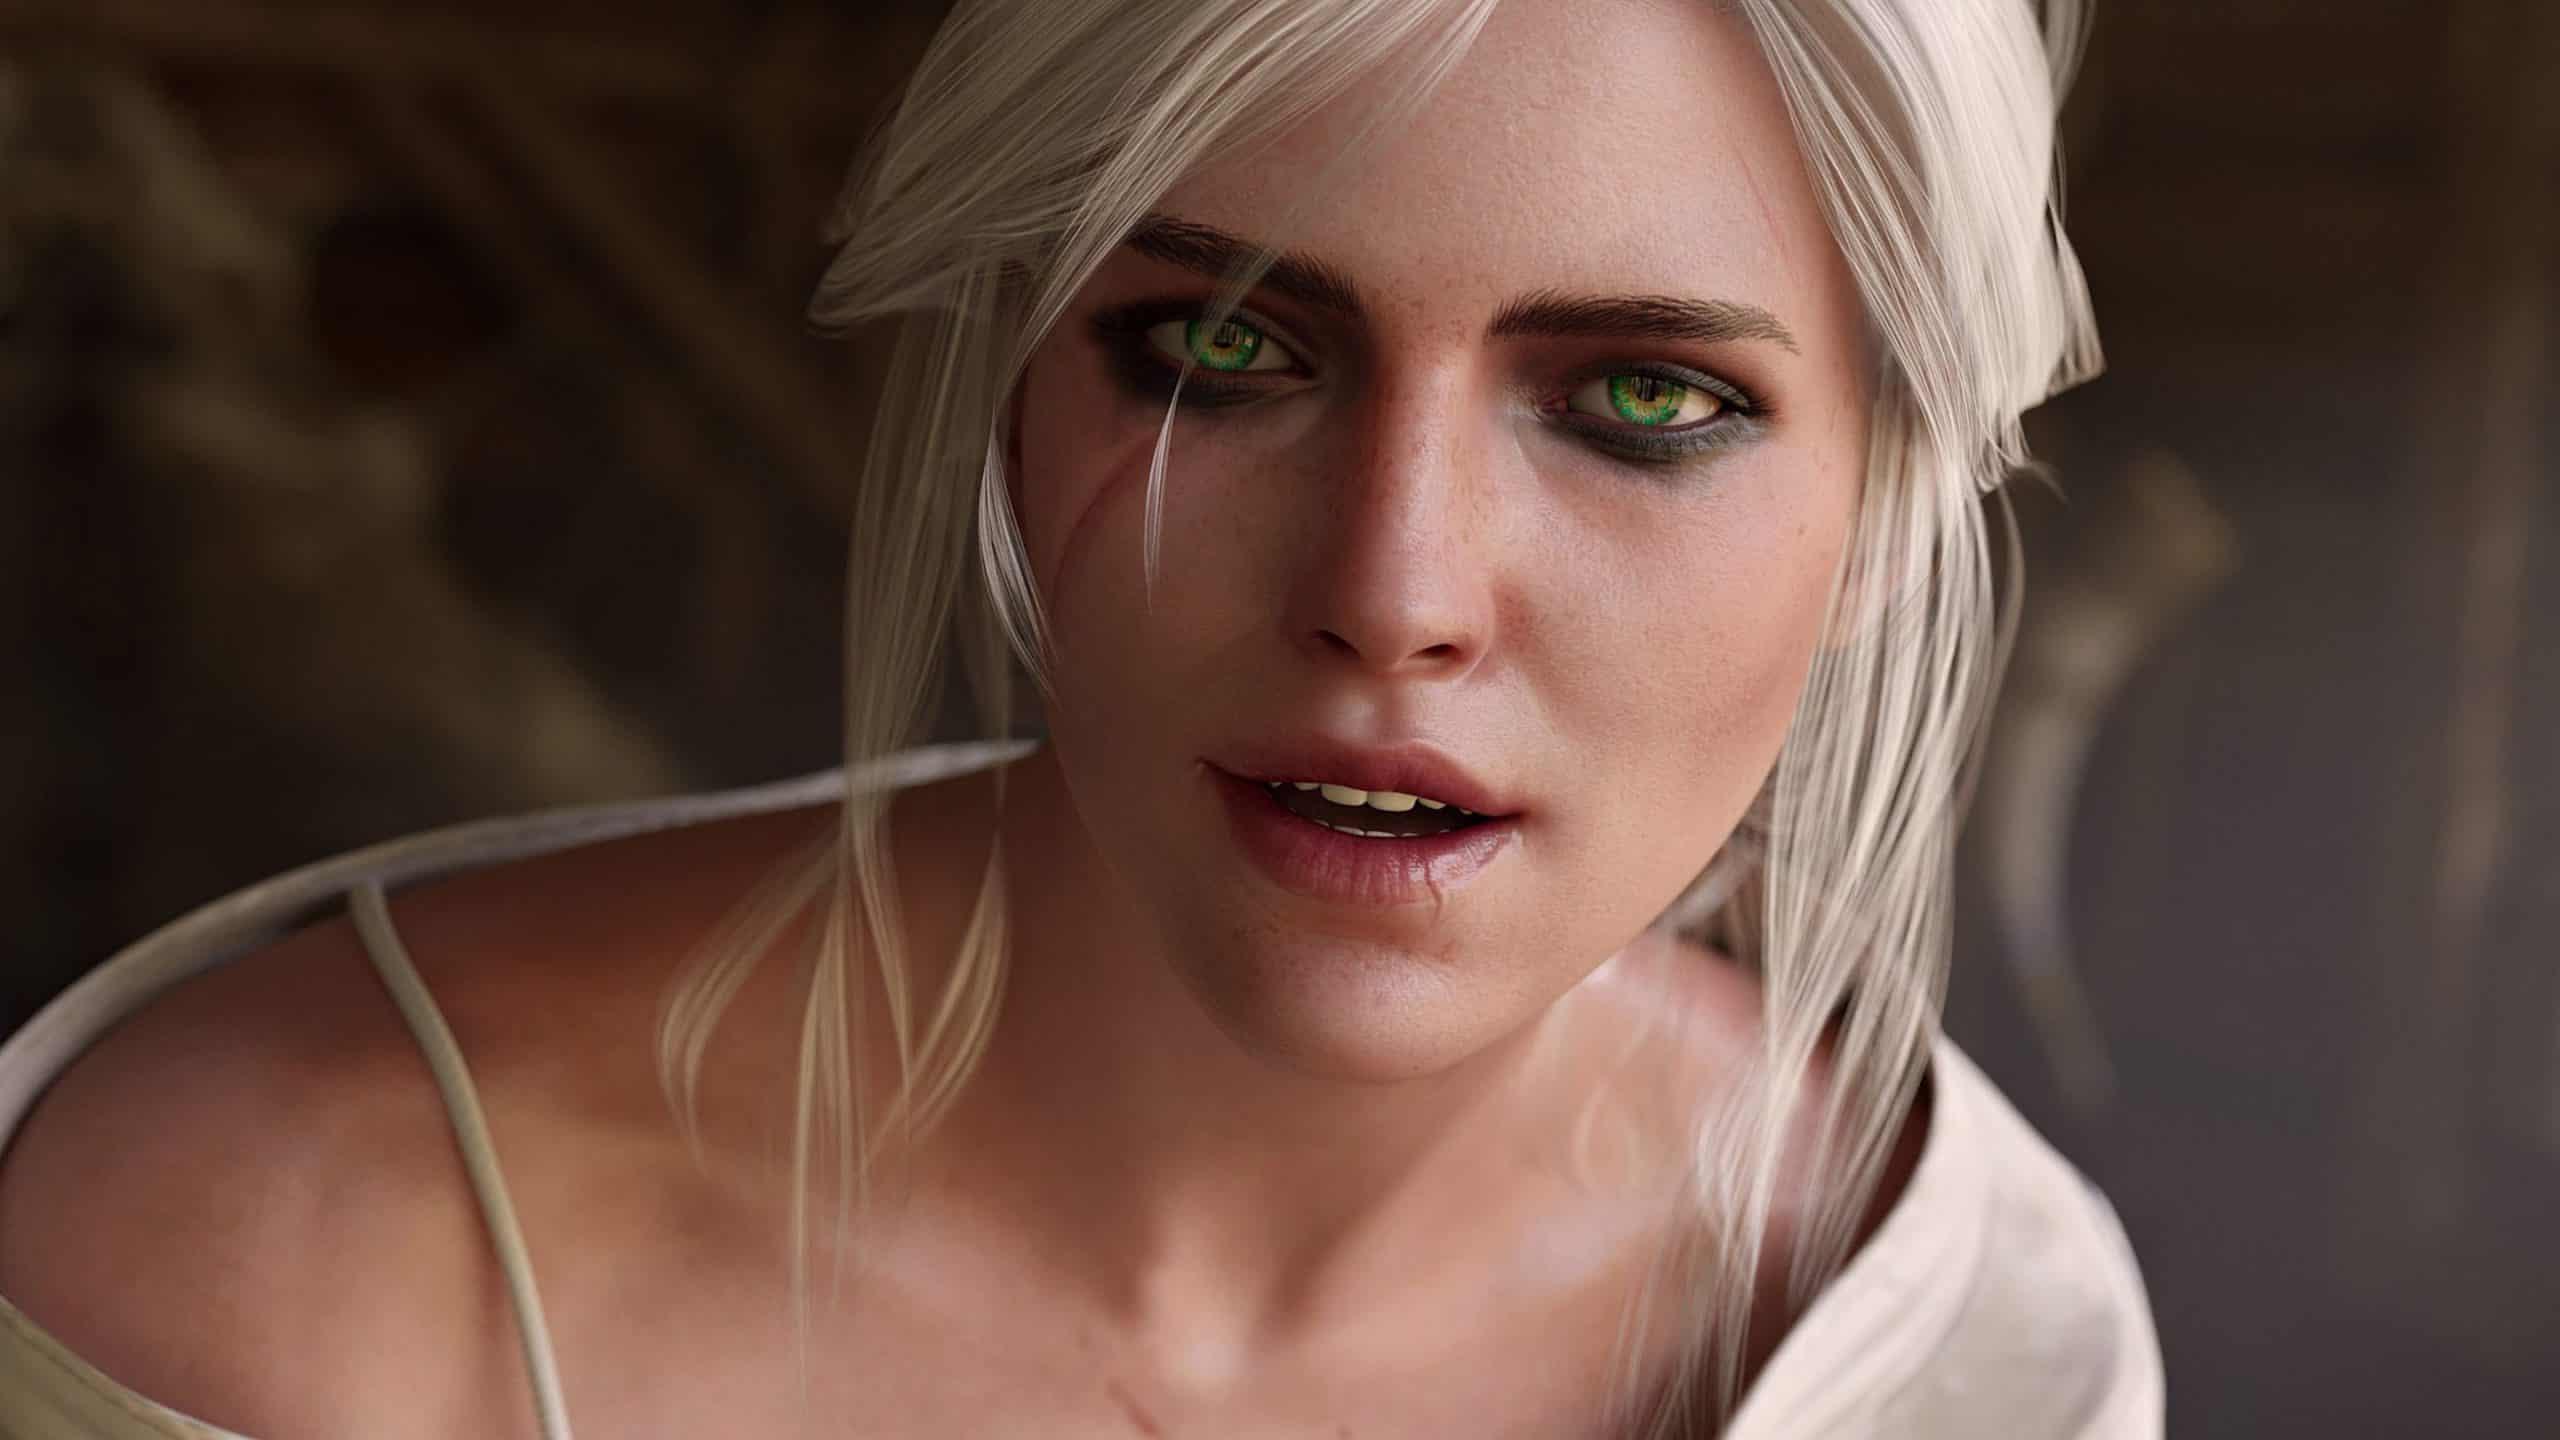 Sonraki The Witcher Oyununda Ana Karakter Ciri Olabilir - SaveButonu